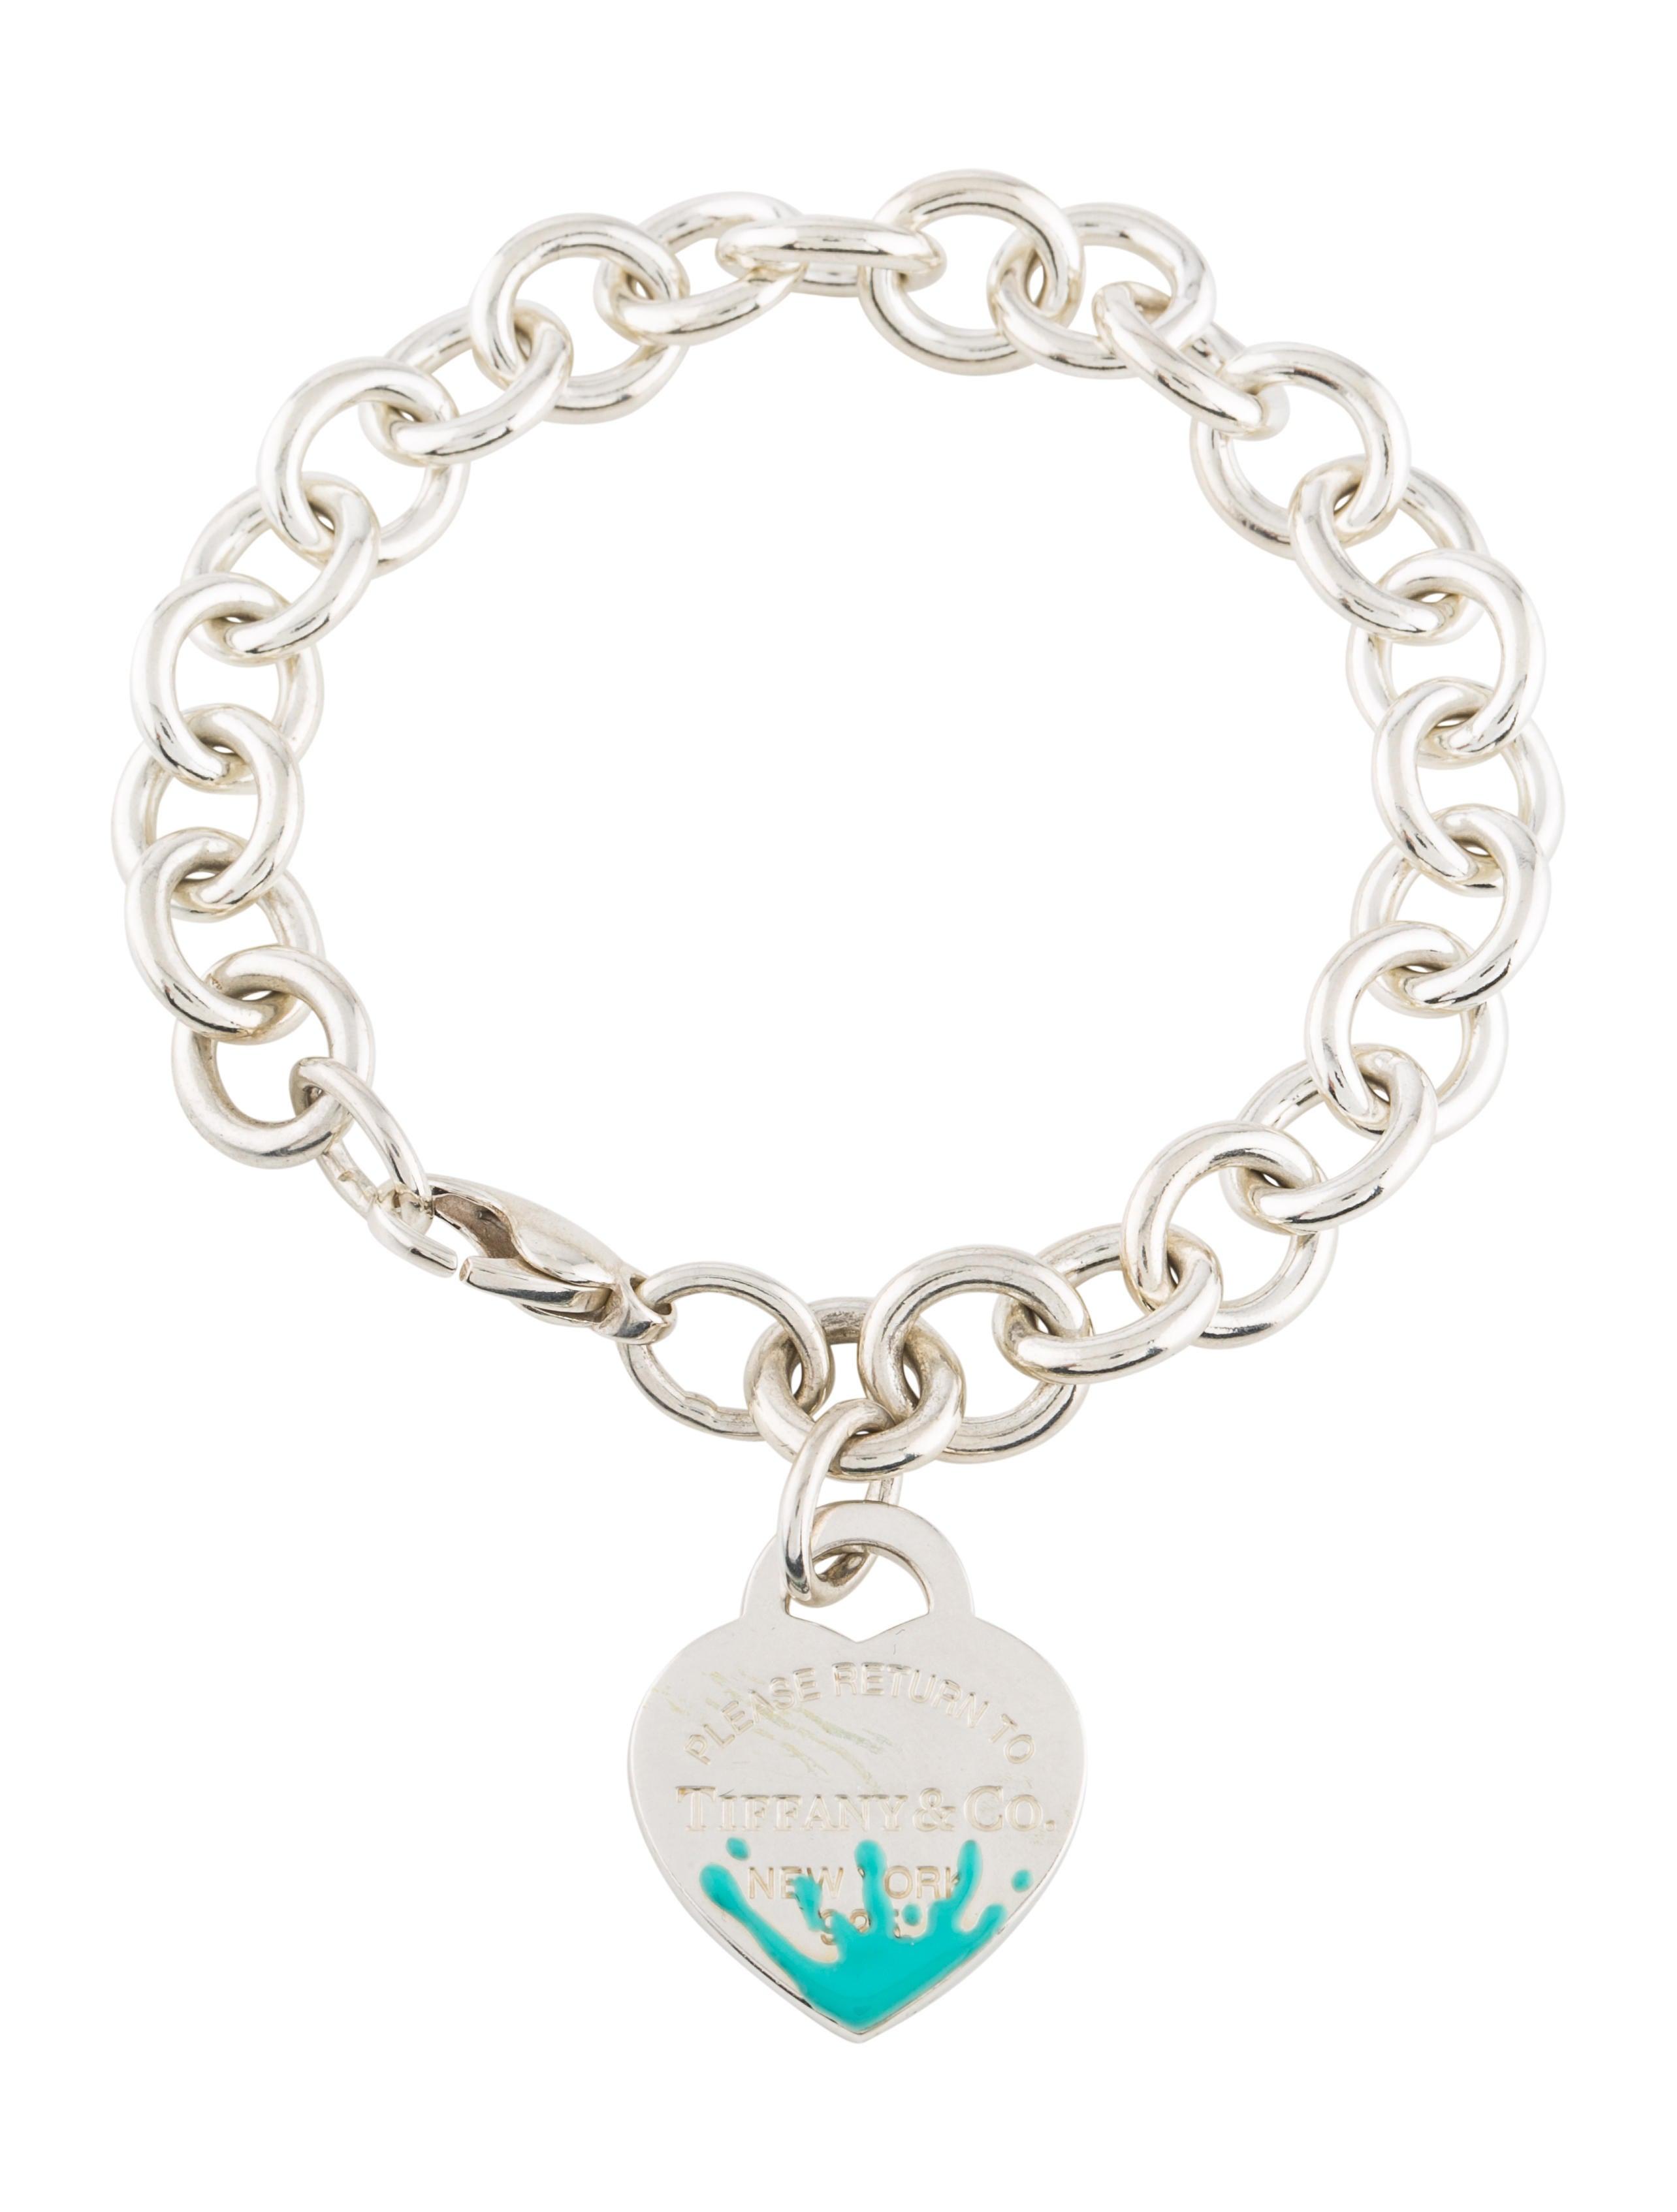 38330e375 Tiffany & Co. Color Splash Heart Tag Bracelet - Bracelets - TIF75400 ...